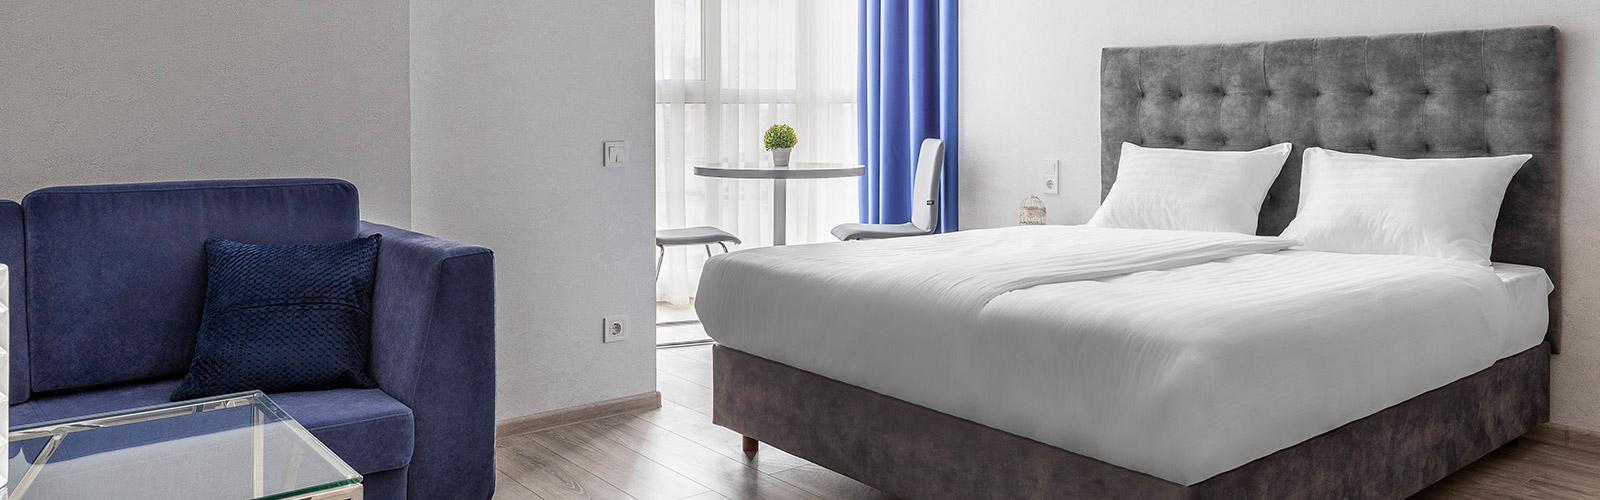 Barasport city apartments - your second homeBarasport city apartments - your second home